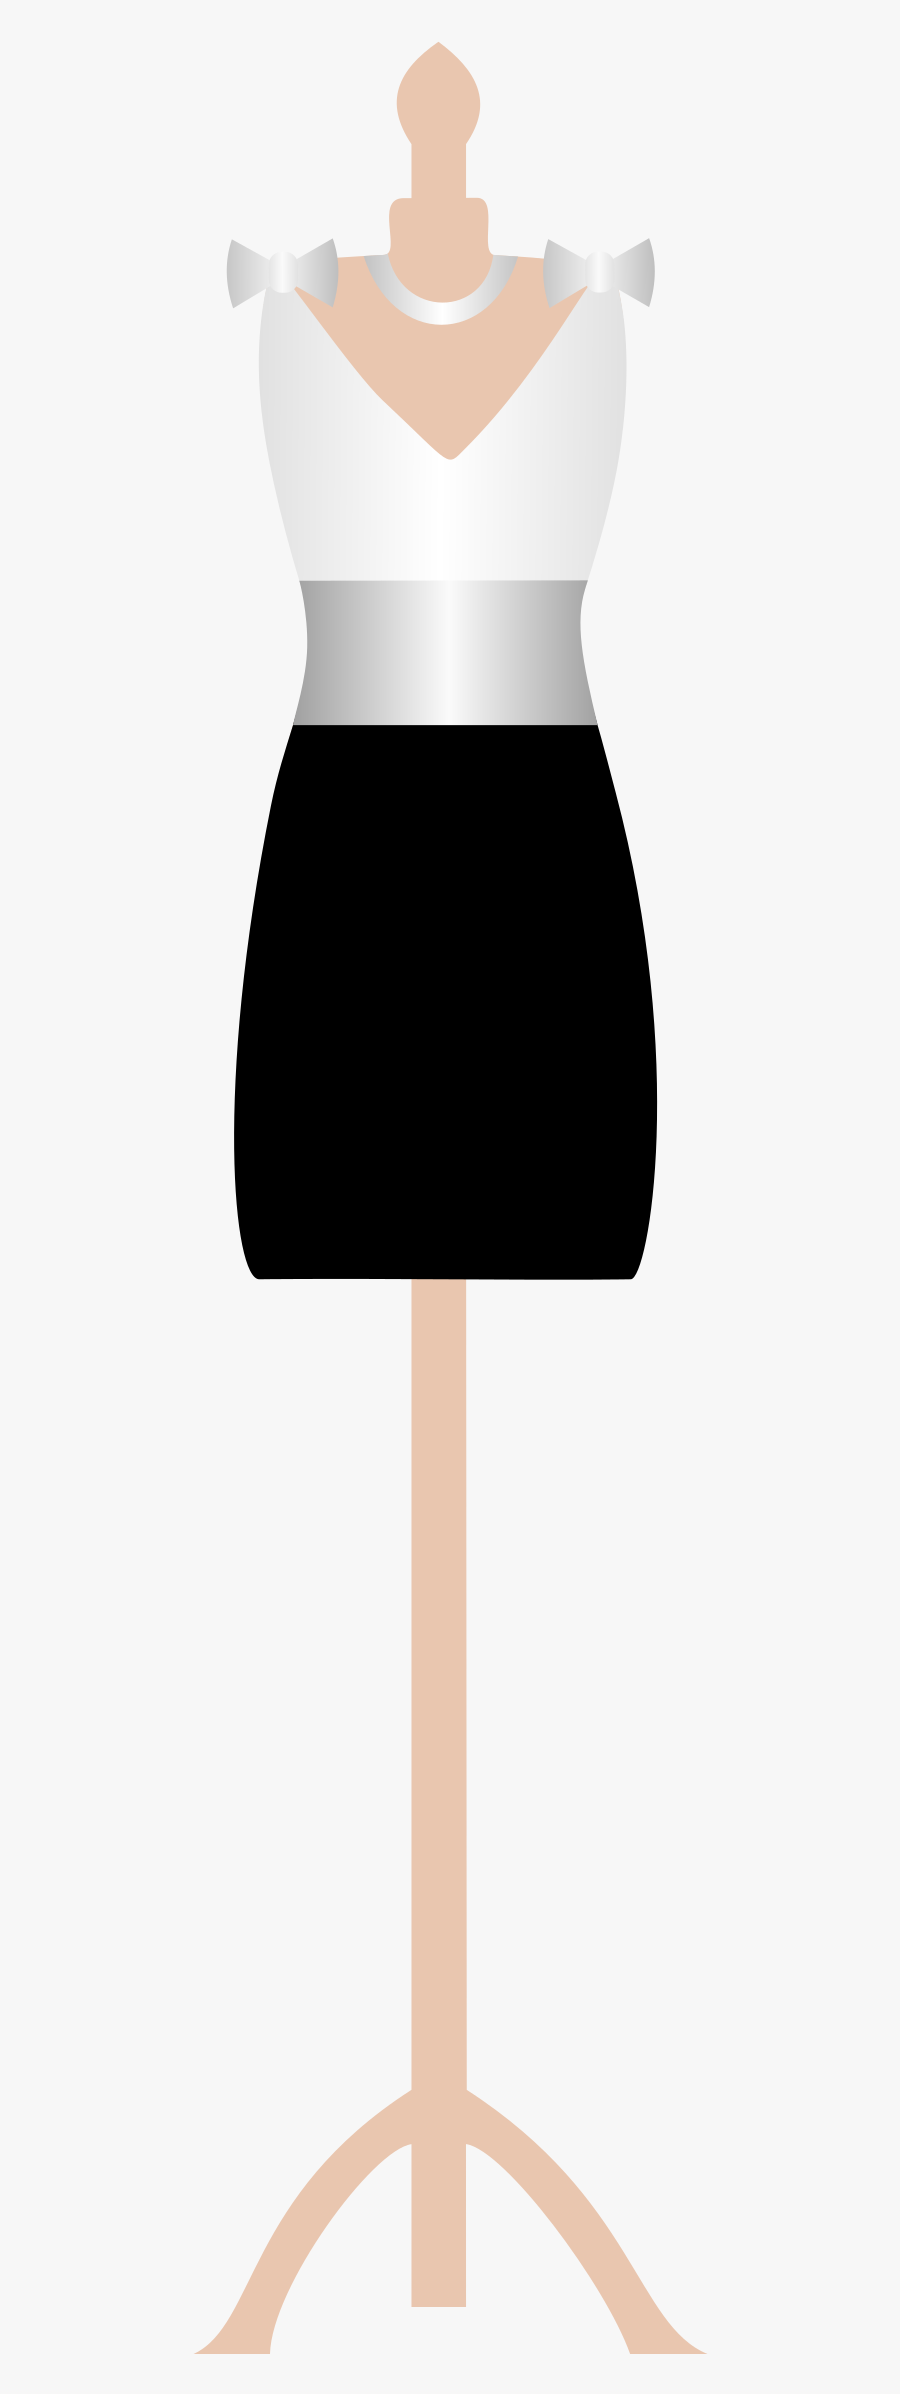 Dress Clipart Png - Dress On Mannequin Png, Transparent Clipart